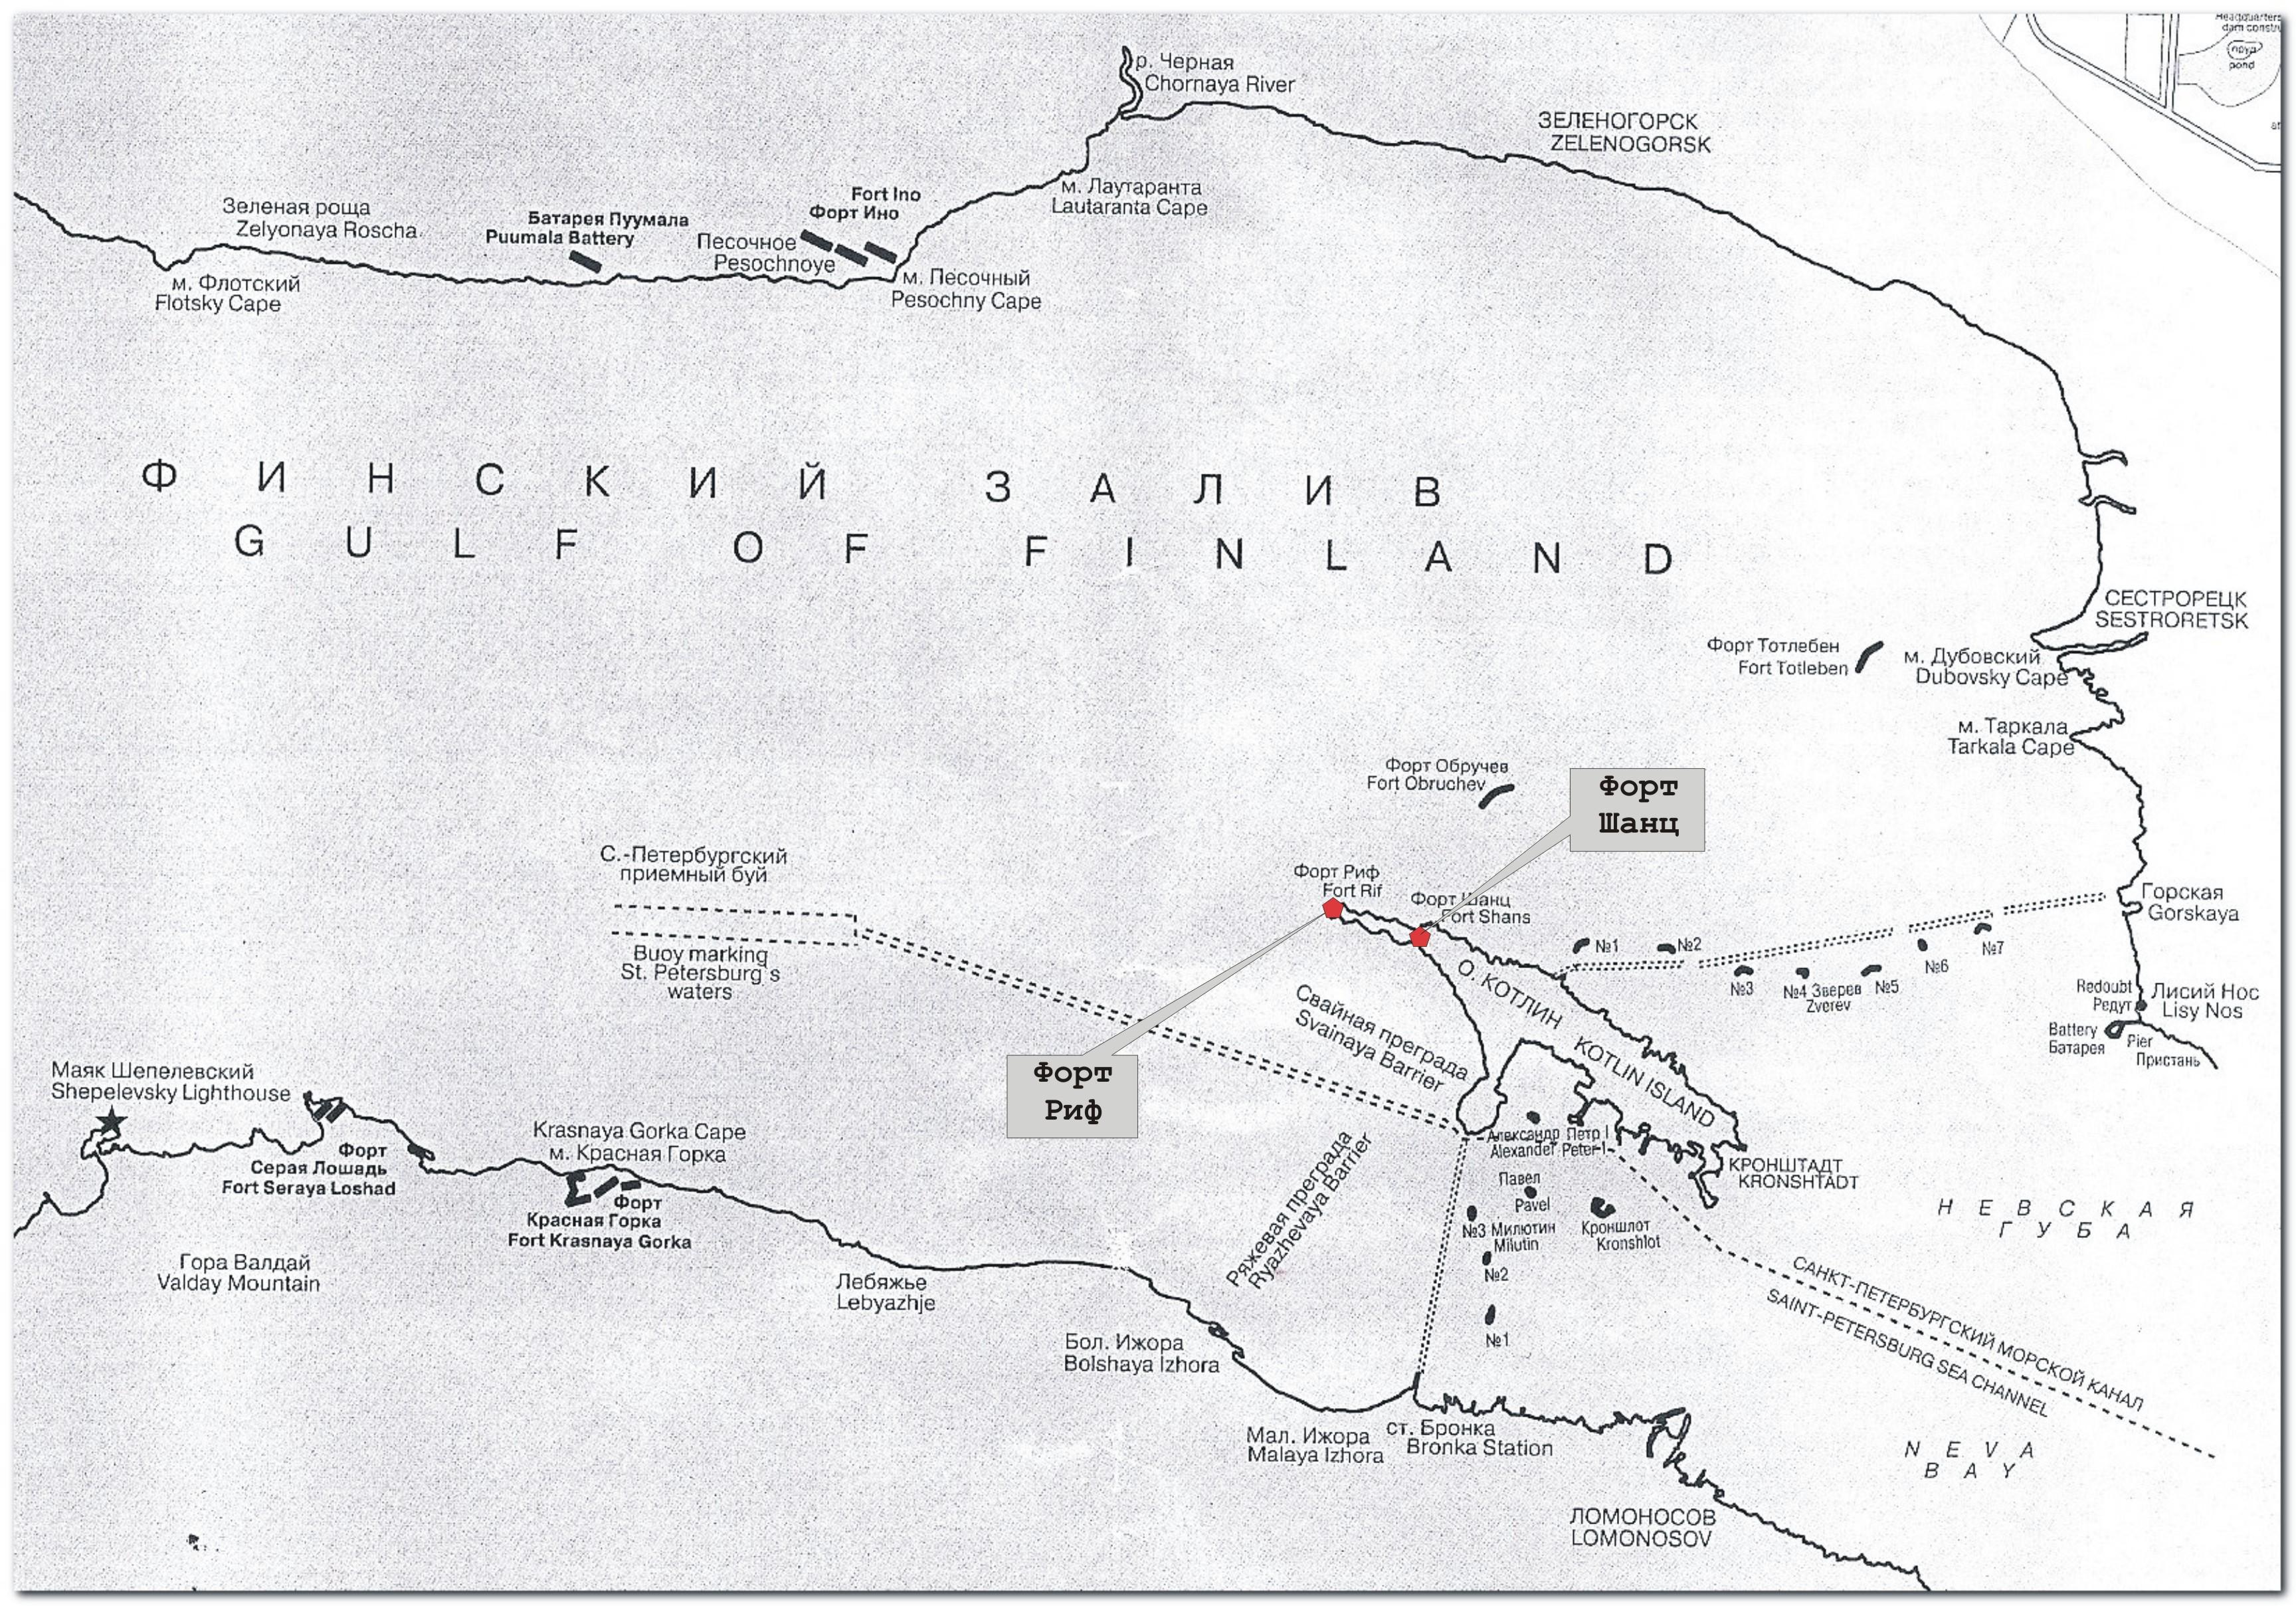 Схема фортов на острове Котлин. Кронштадт